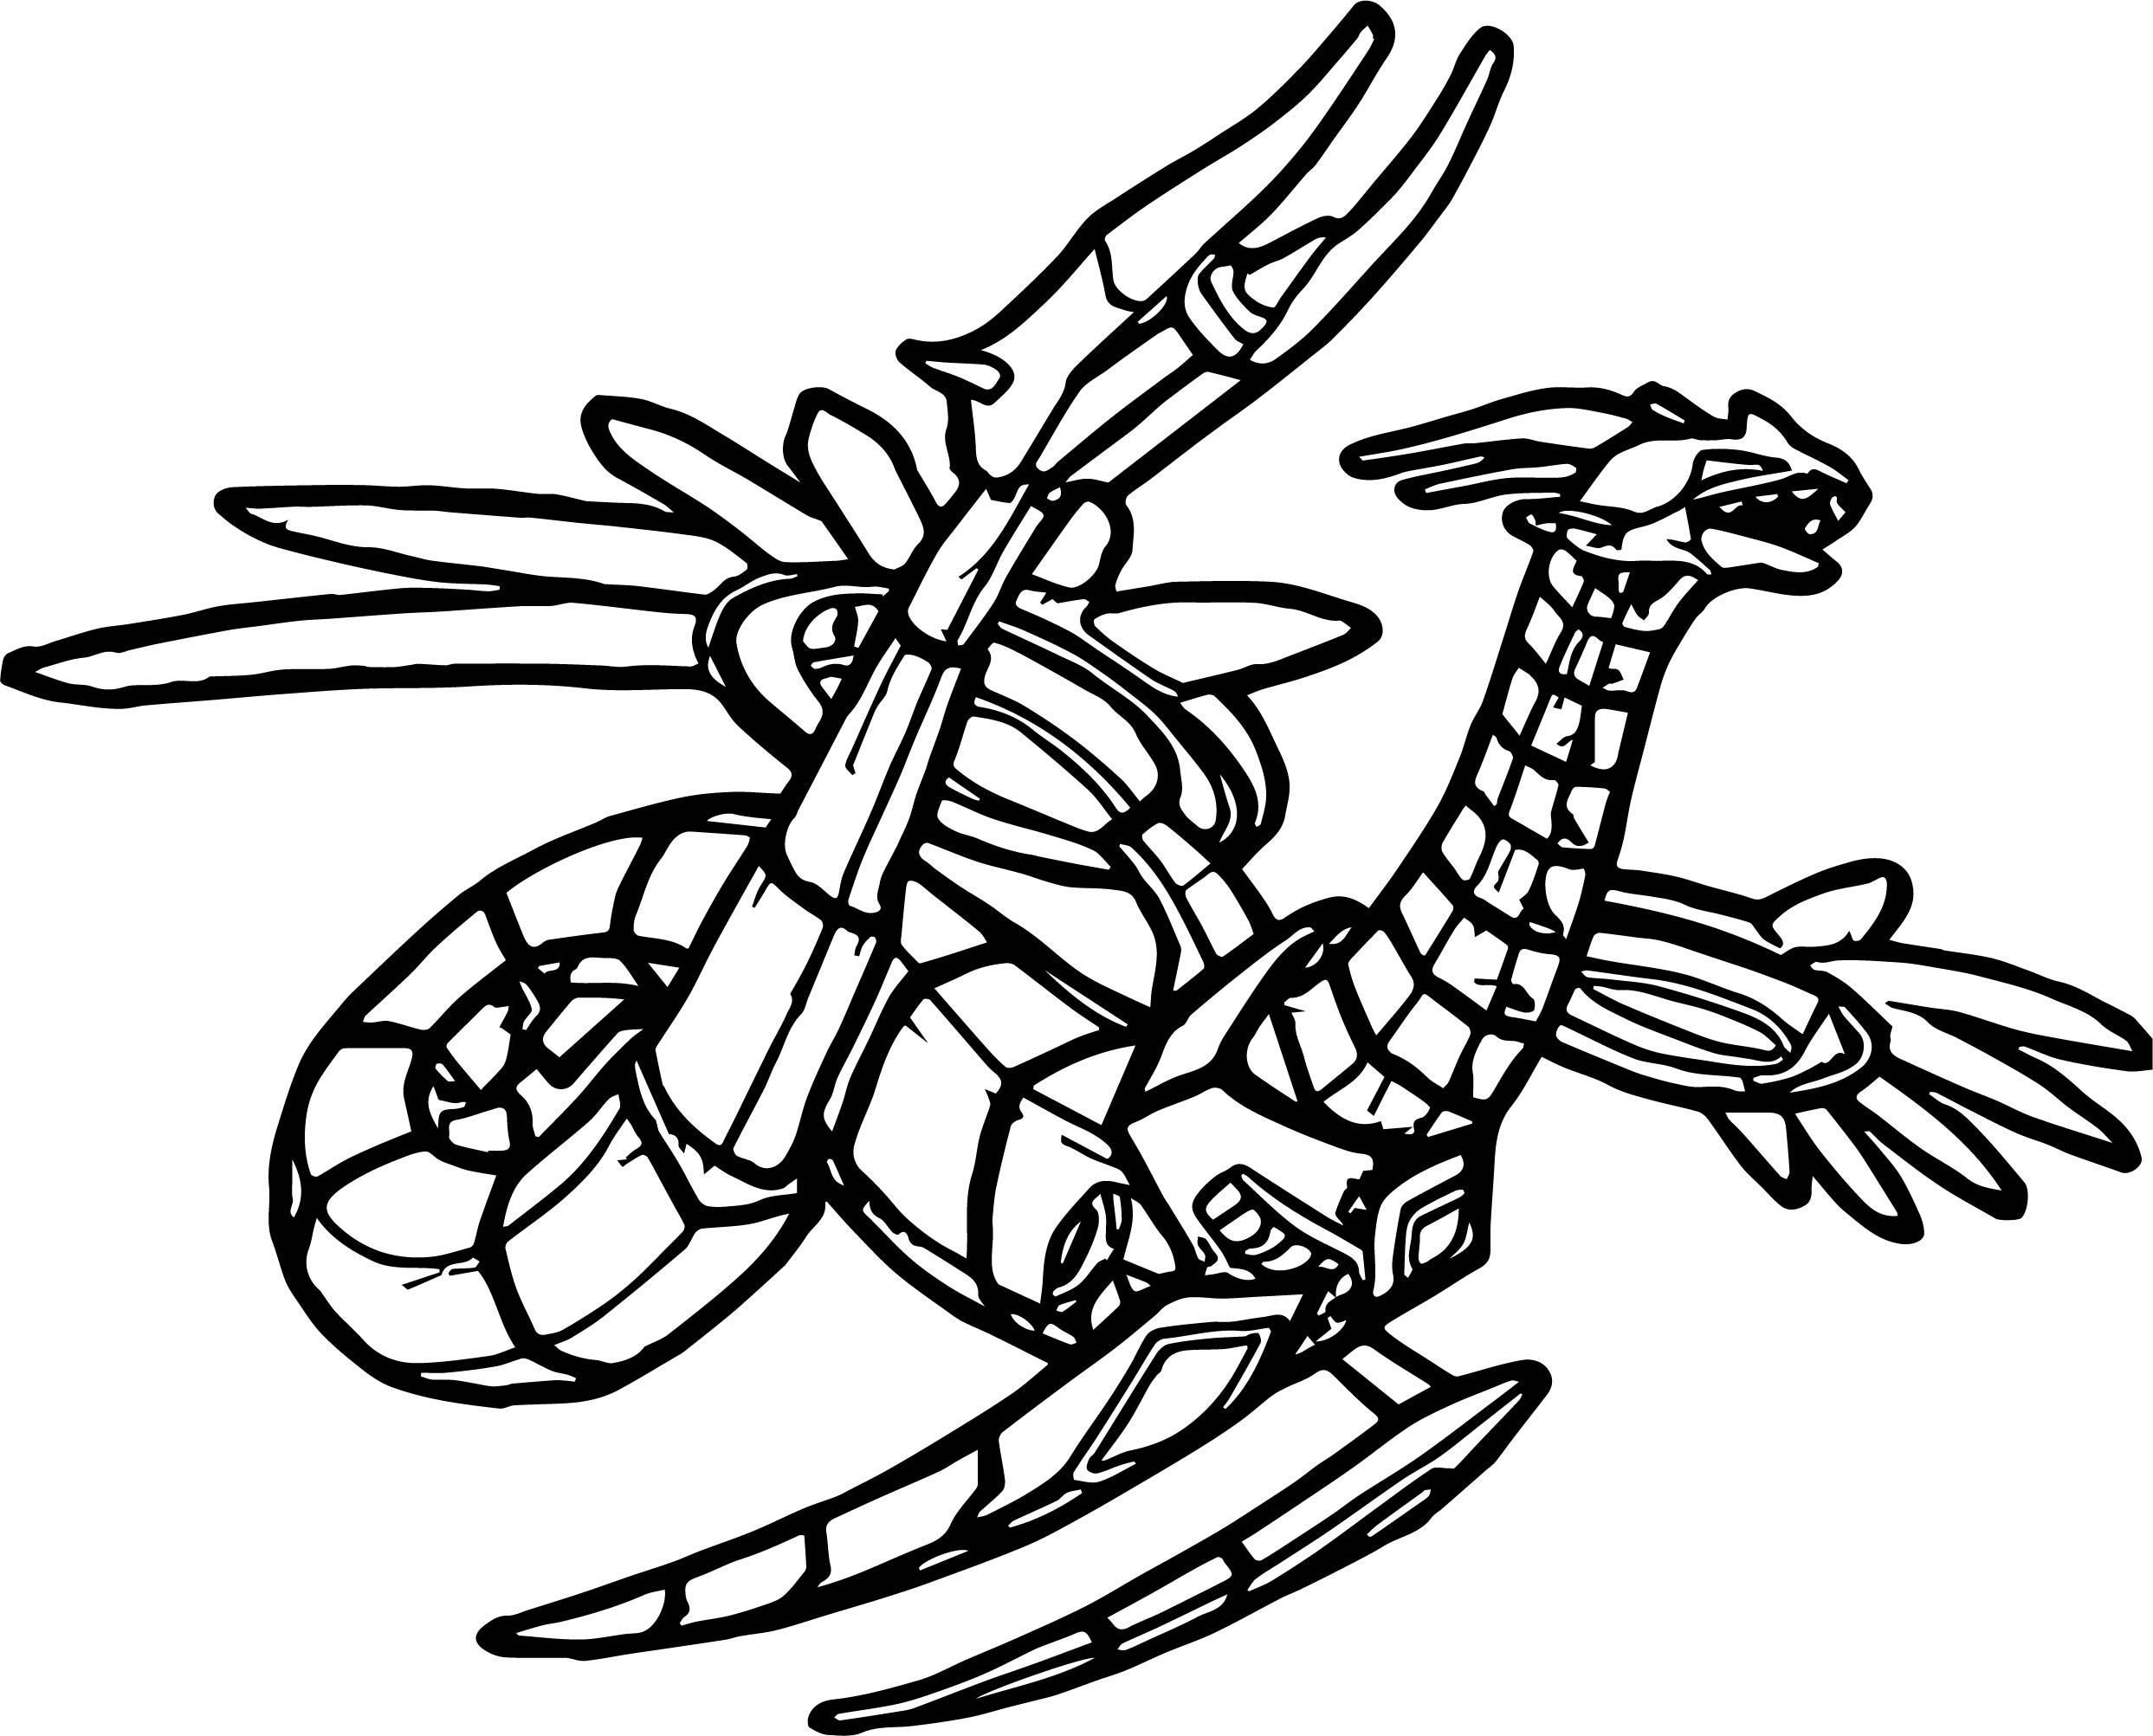 Bakugan Altair Coloring Page